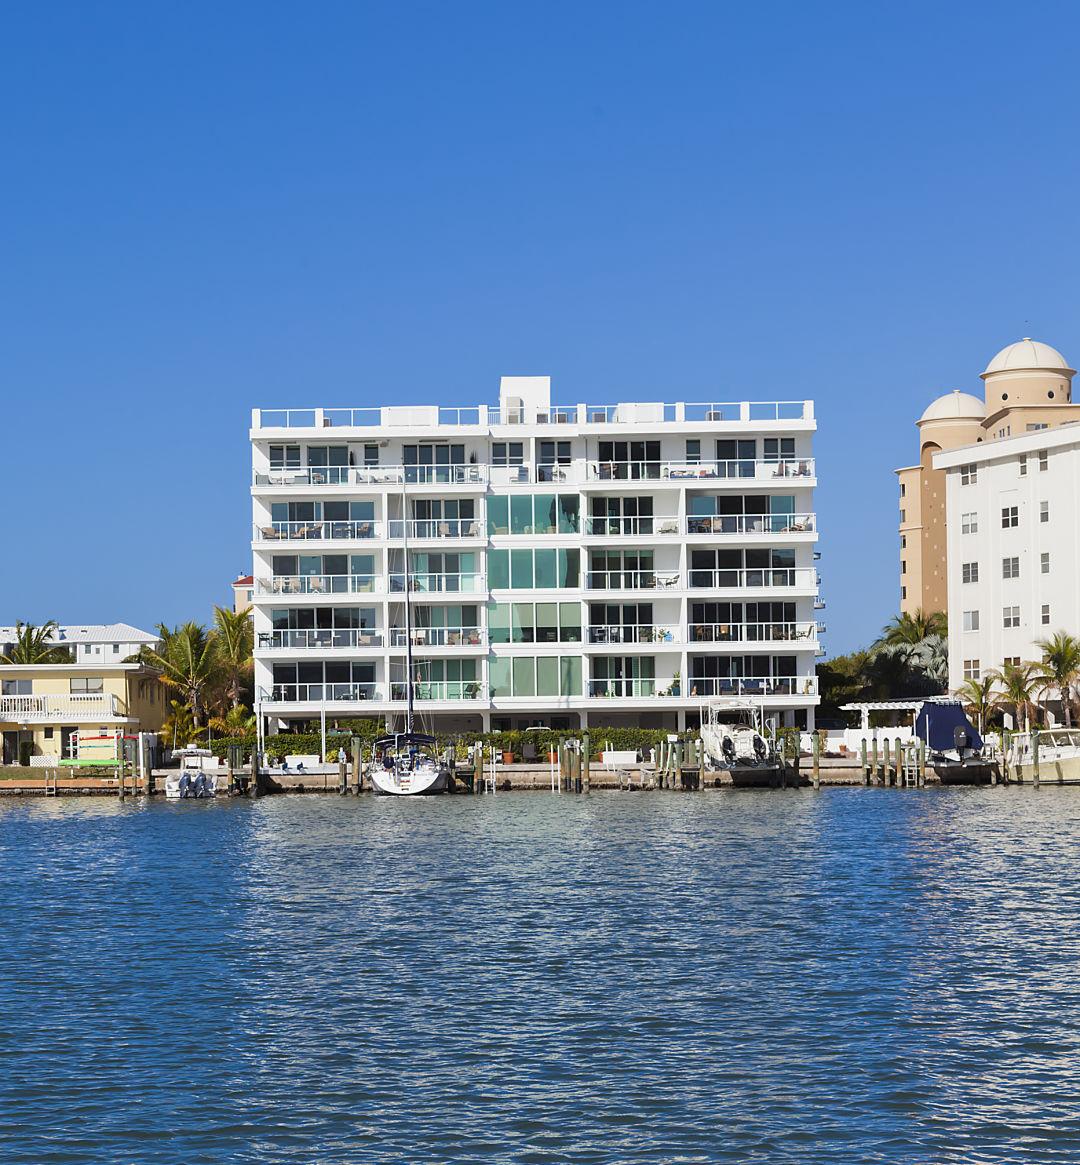 2017 Beautification Award Winner - Harbor View 650 GGP